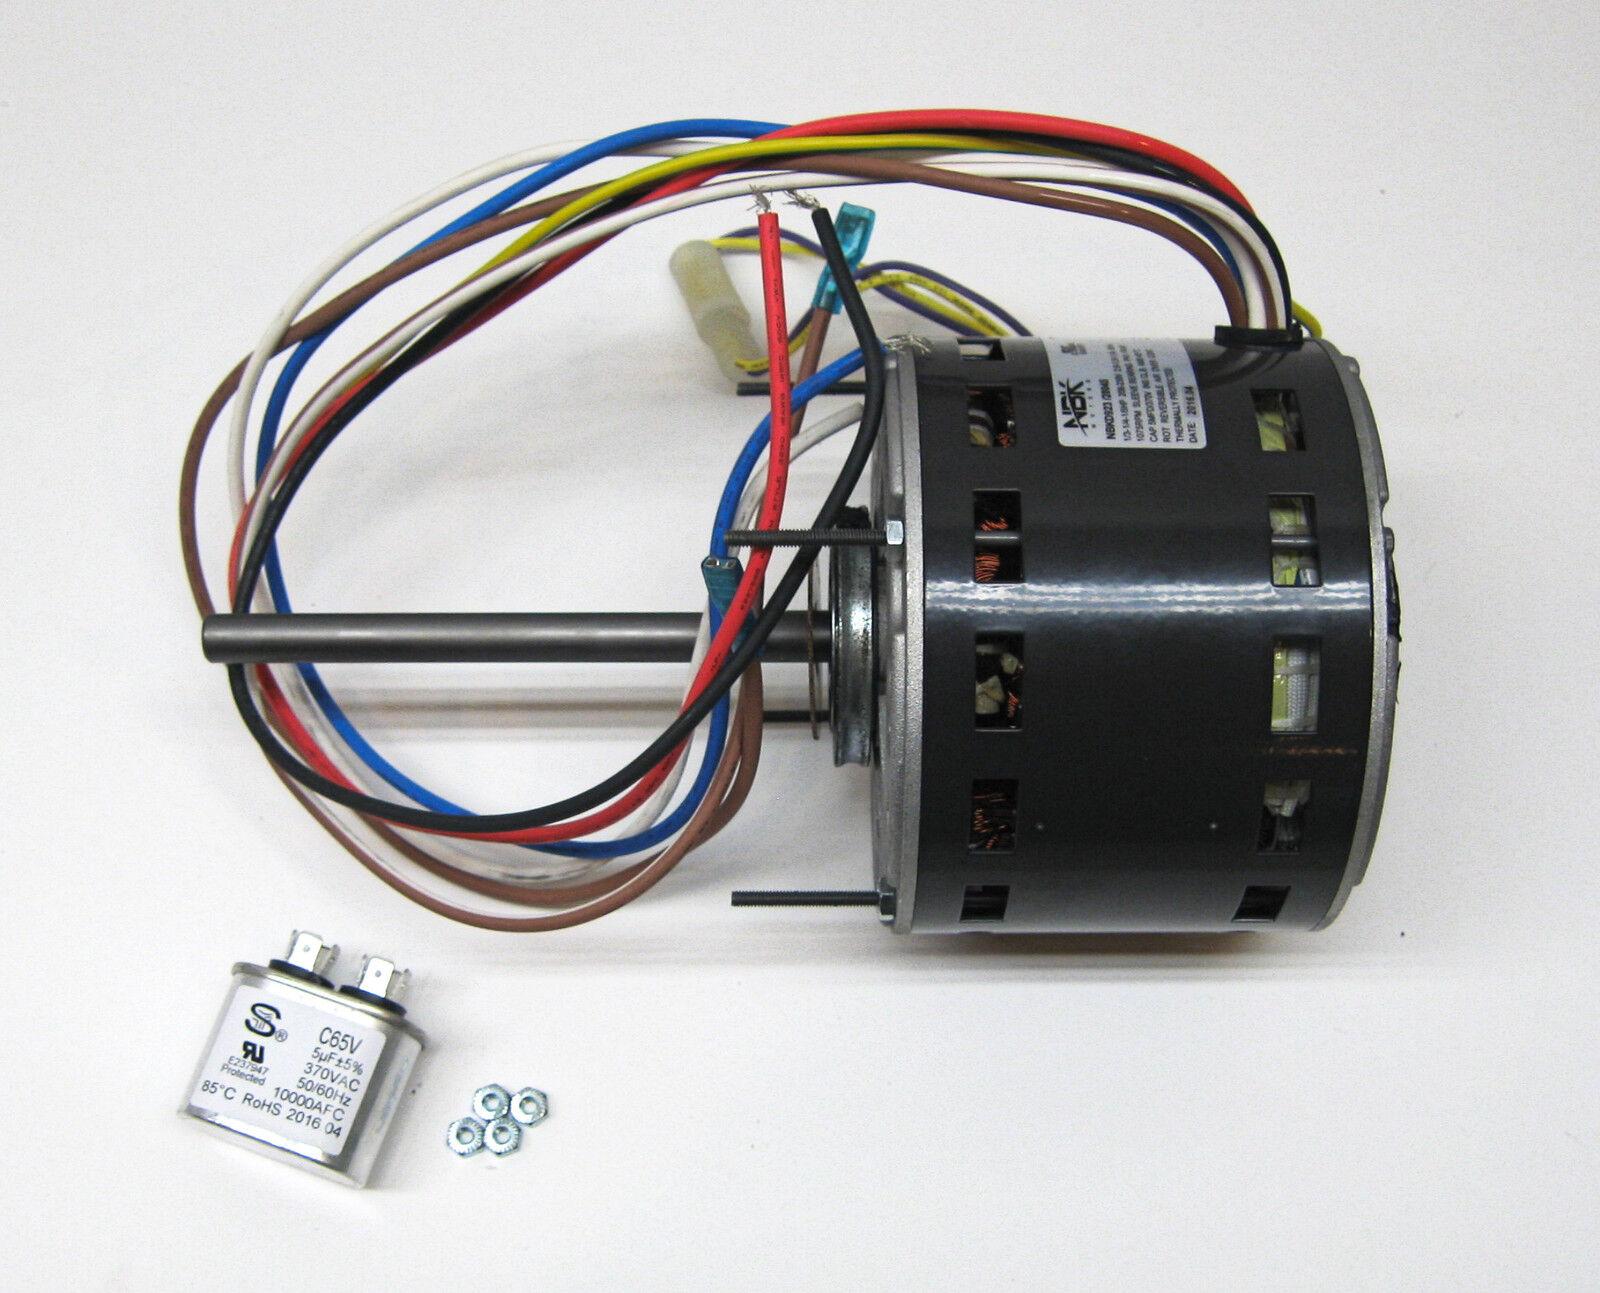 hight resolution of furnace air handler blower motor 1 3 hp 1075 rpm 230 volt 3 speed rh ebay mars 10589 wiring diagram